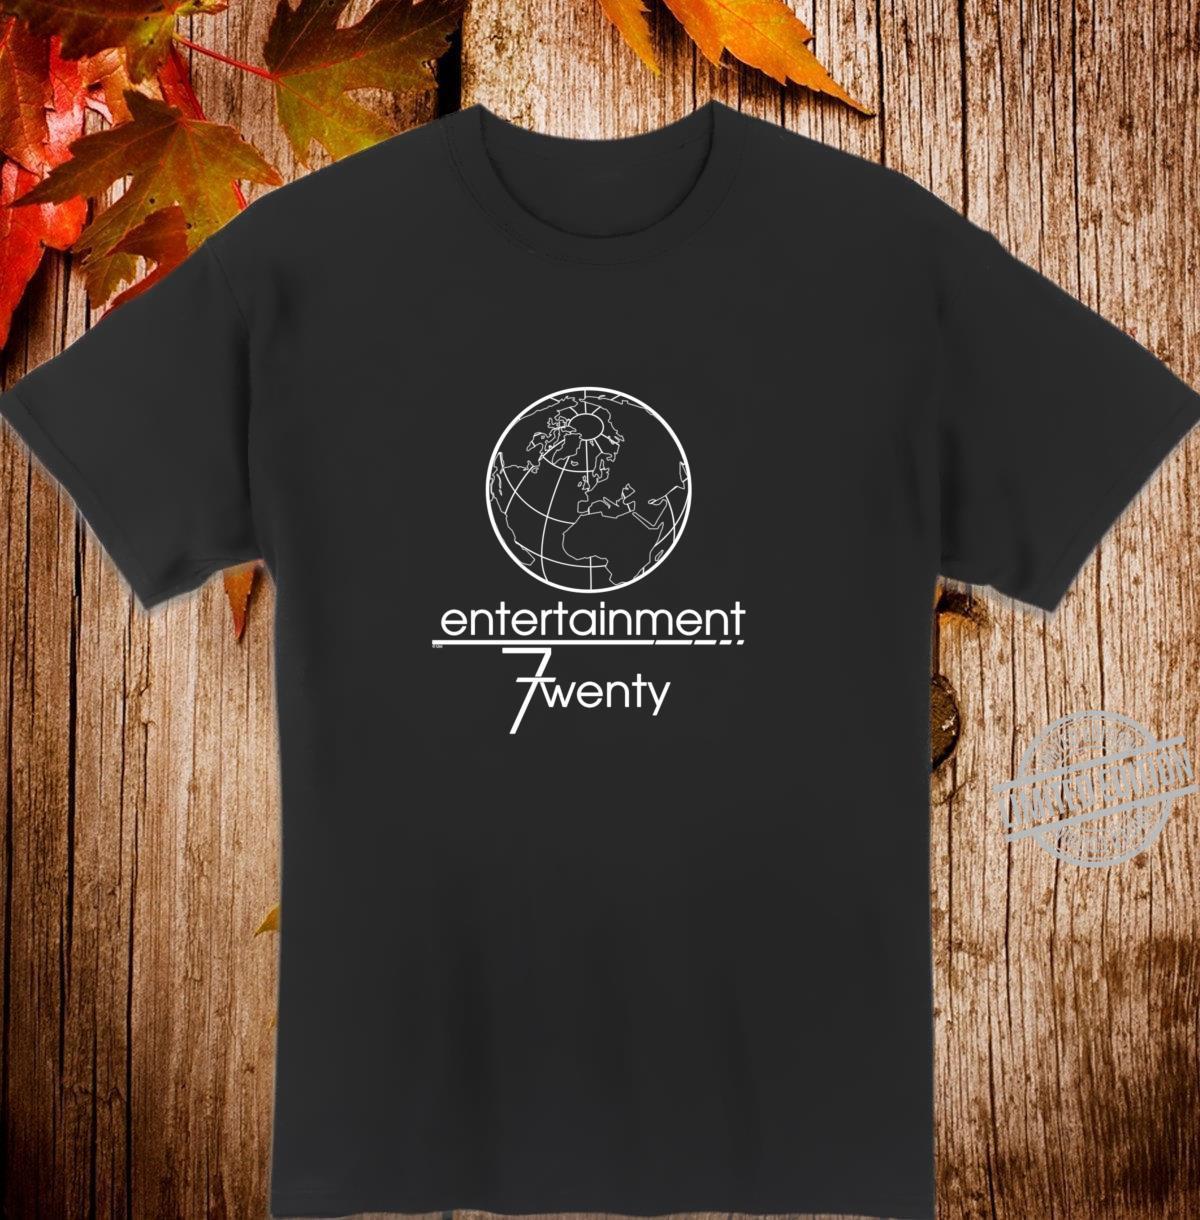 Parks & Recreation Unterhaltung 7 Zwanzig Langarmshirt Shirt